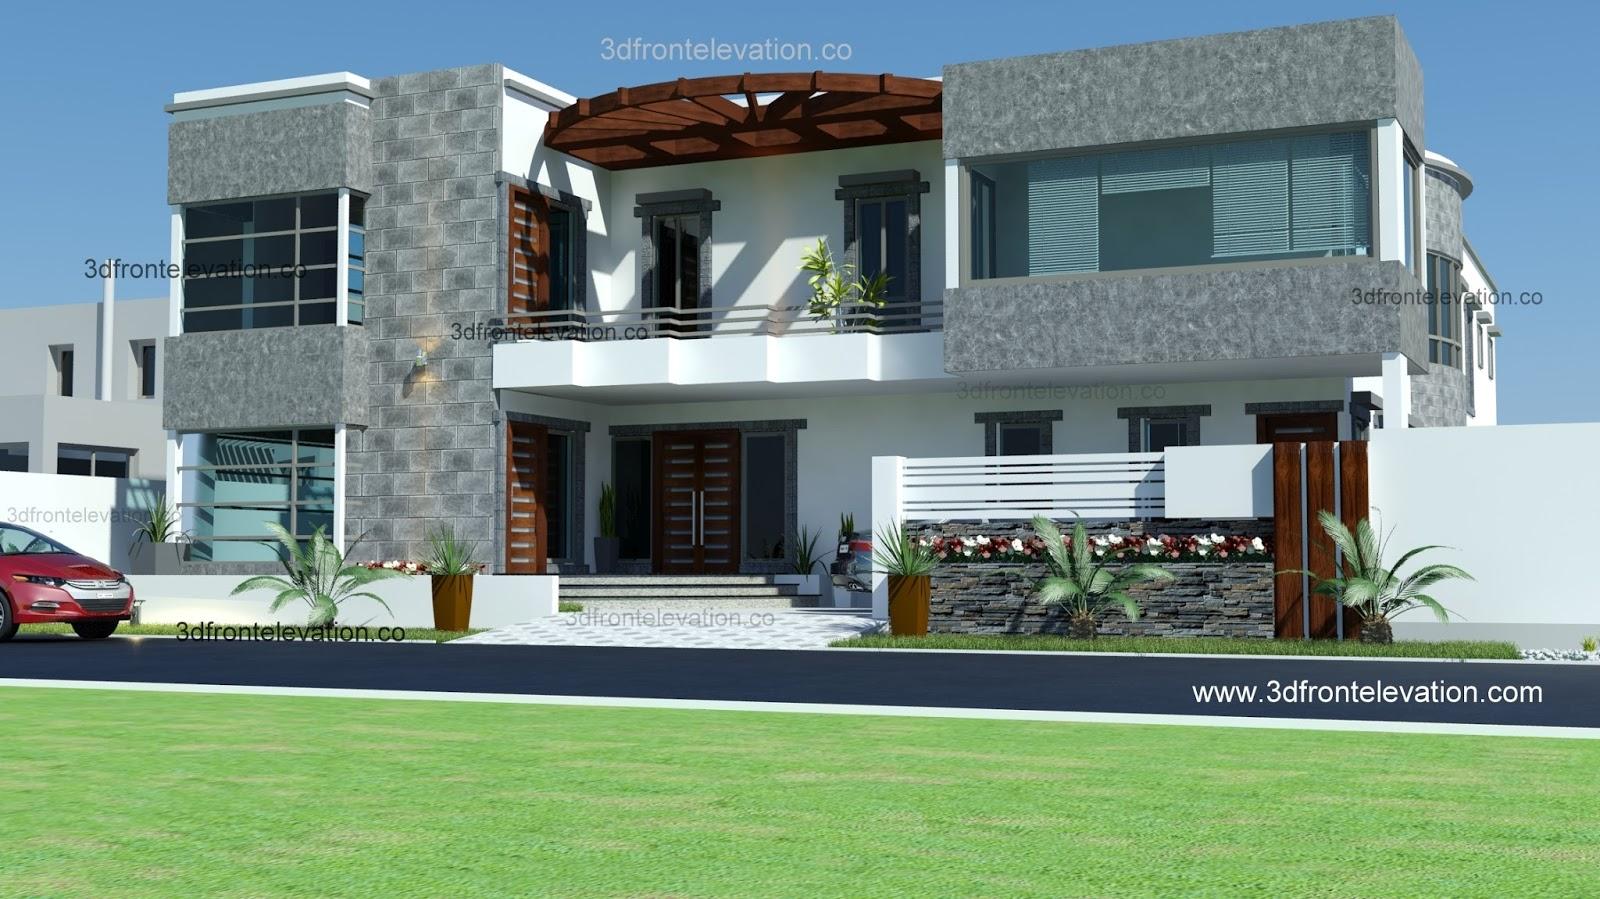 Front Elevation Designs In Karachi : D front elevation portfolio